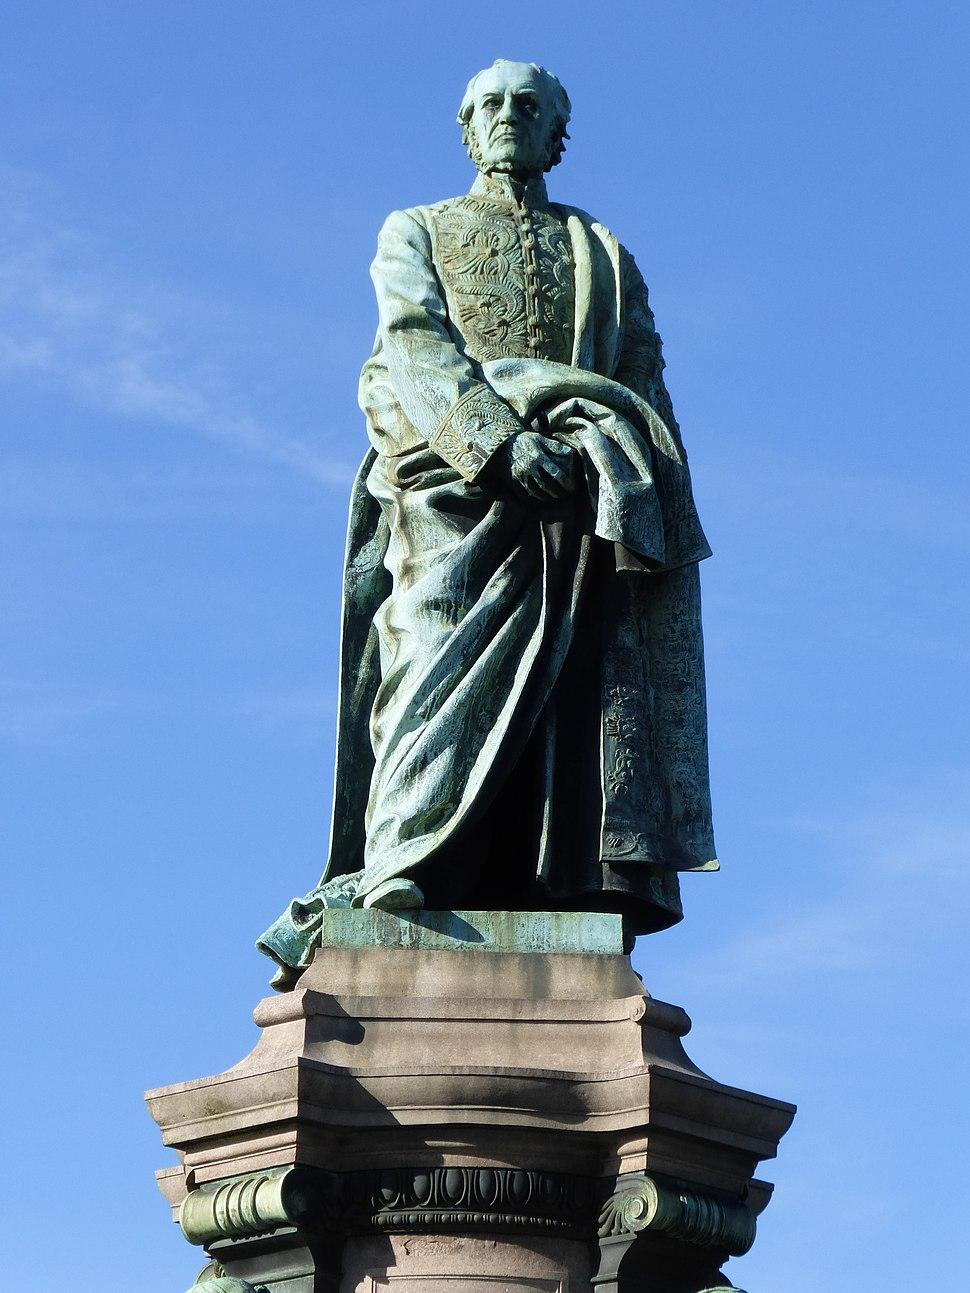 Gladstone Monument statue, Coates Crescent Gardens, Edinburgh